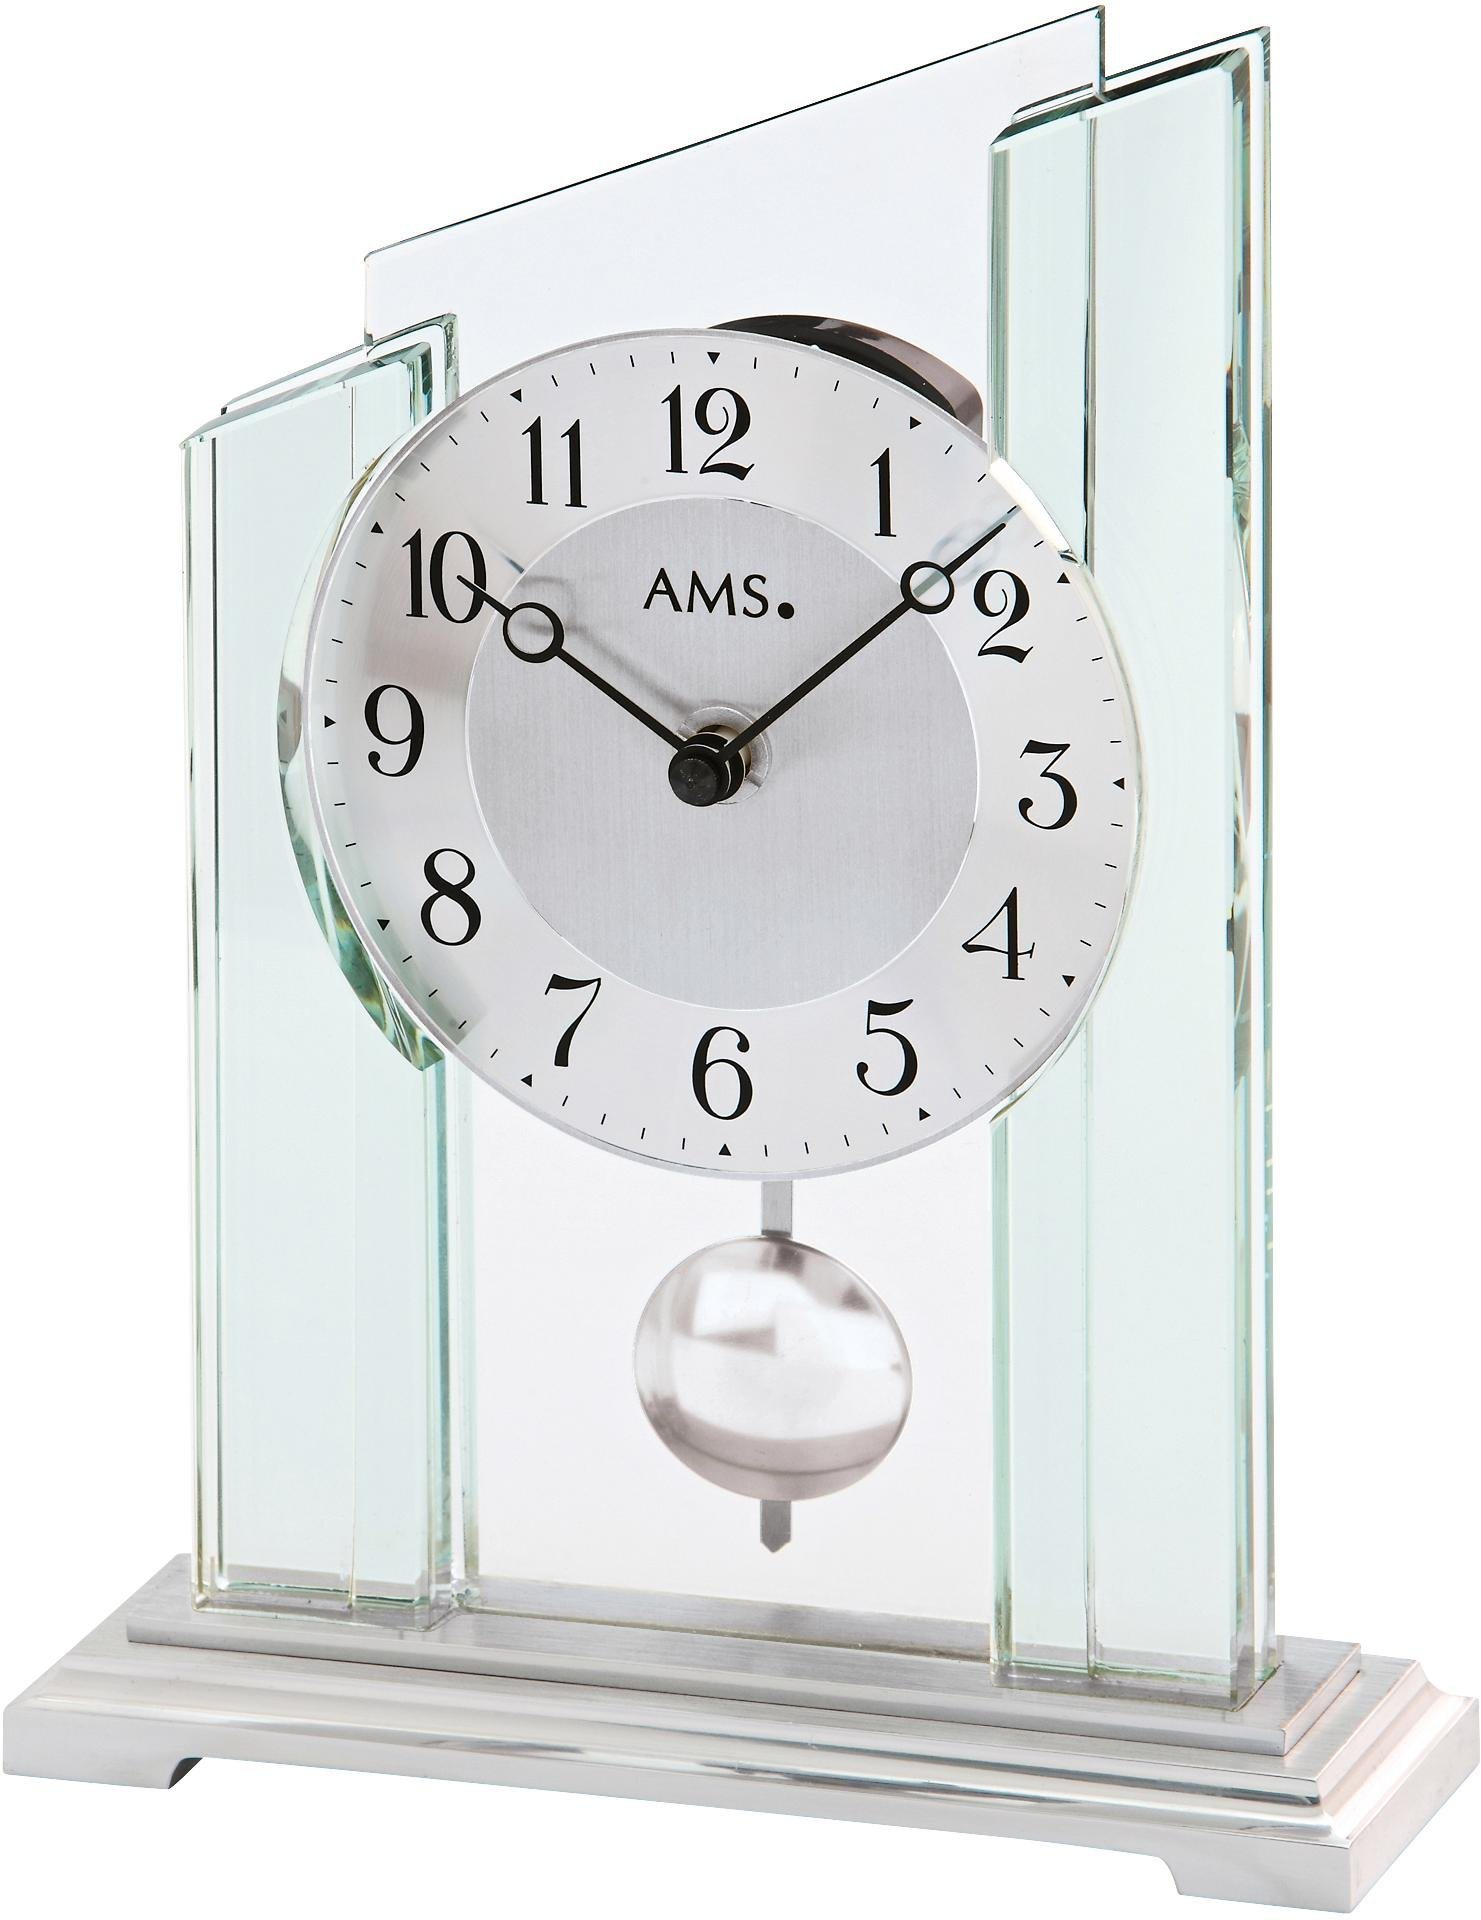 AMS Pendeltischuhr »T1168« | Dekoration > Uhren > Standuhren | Metall - Glas | AMS